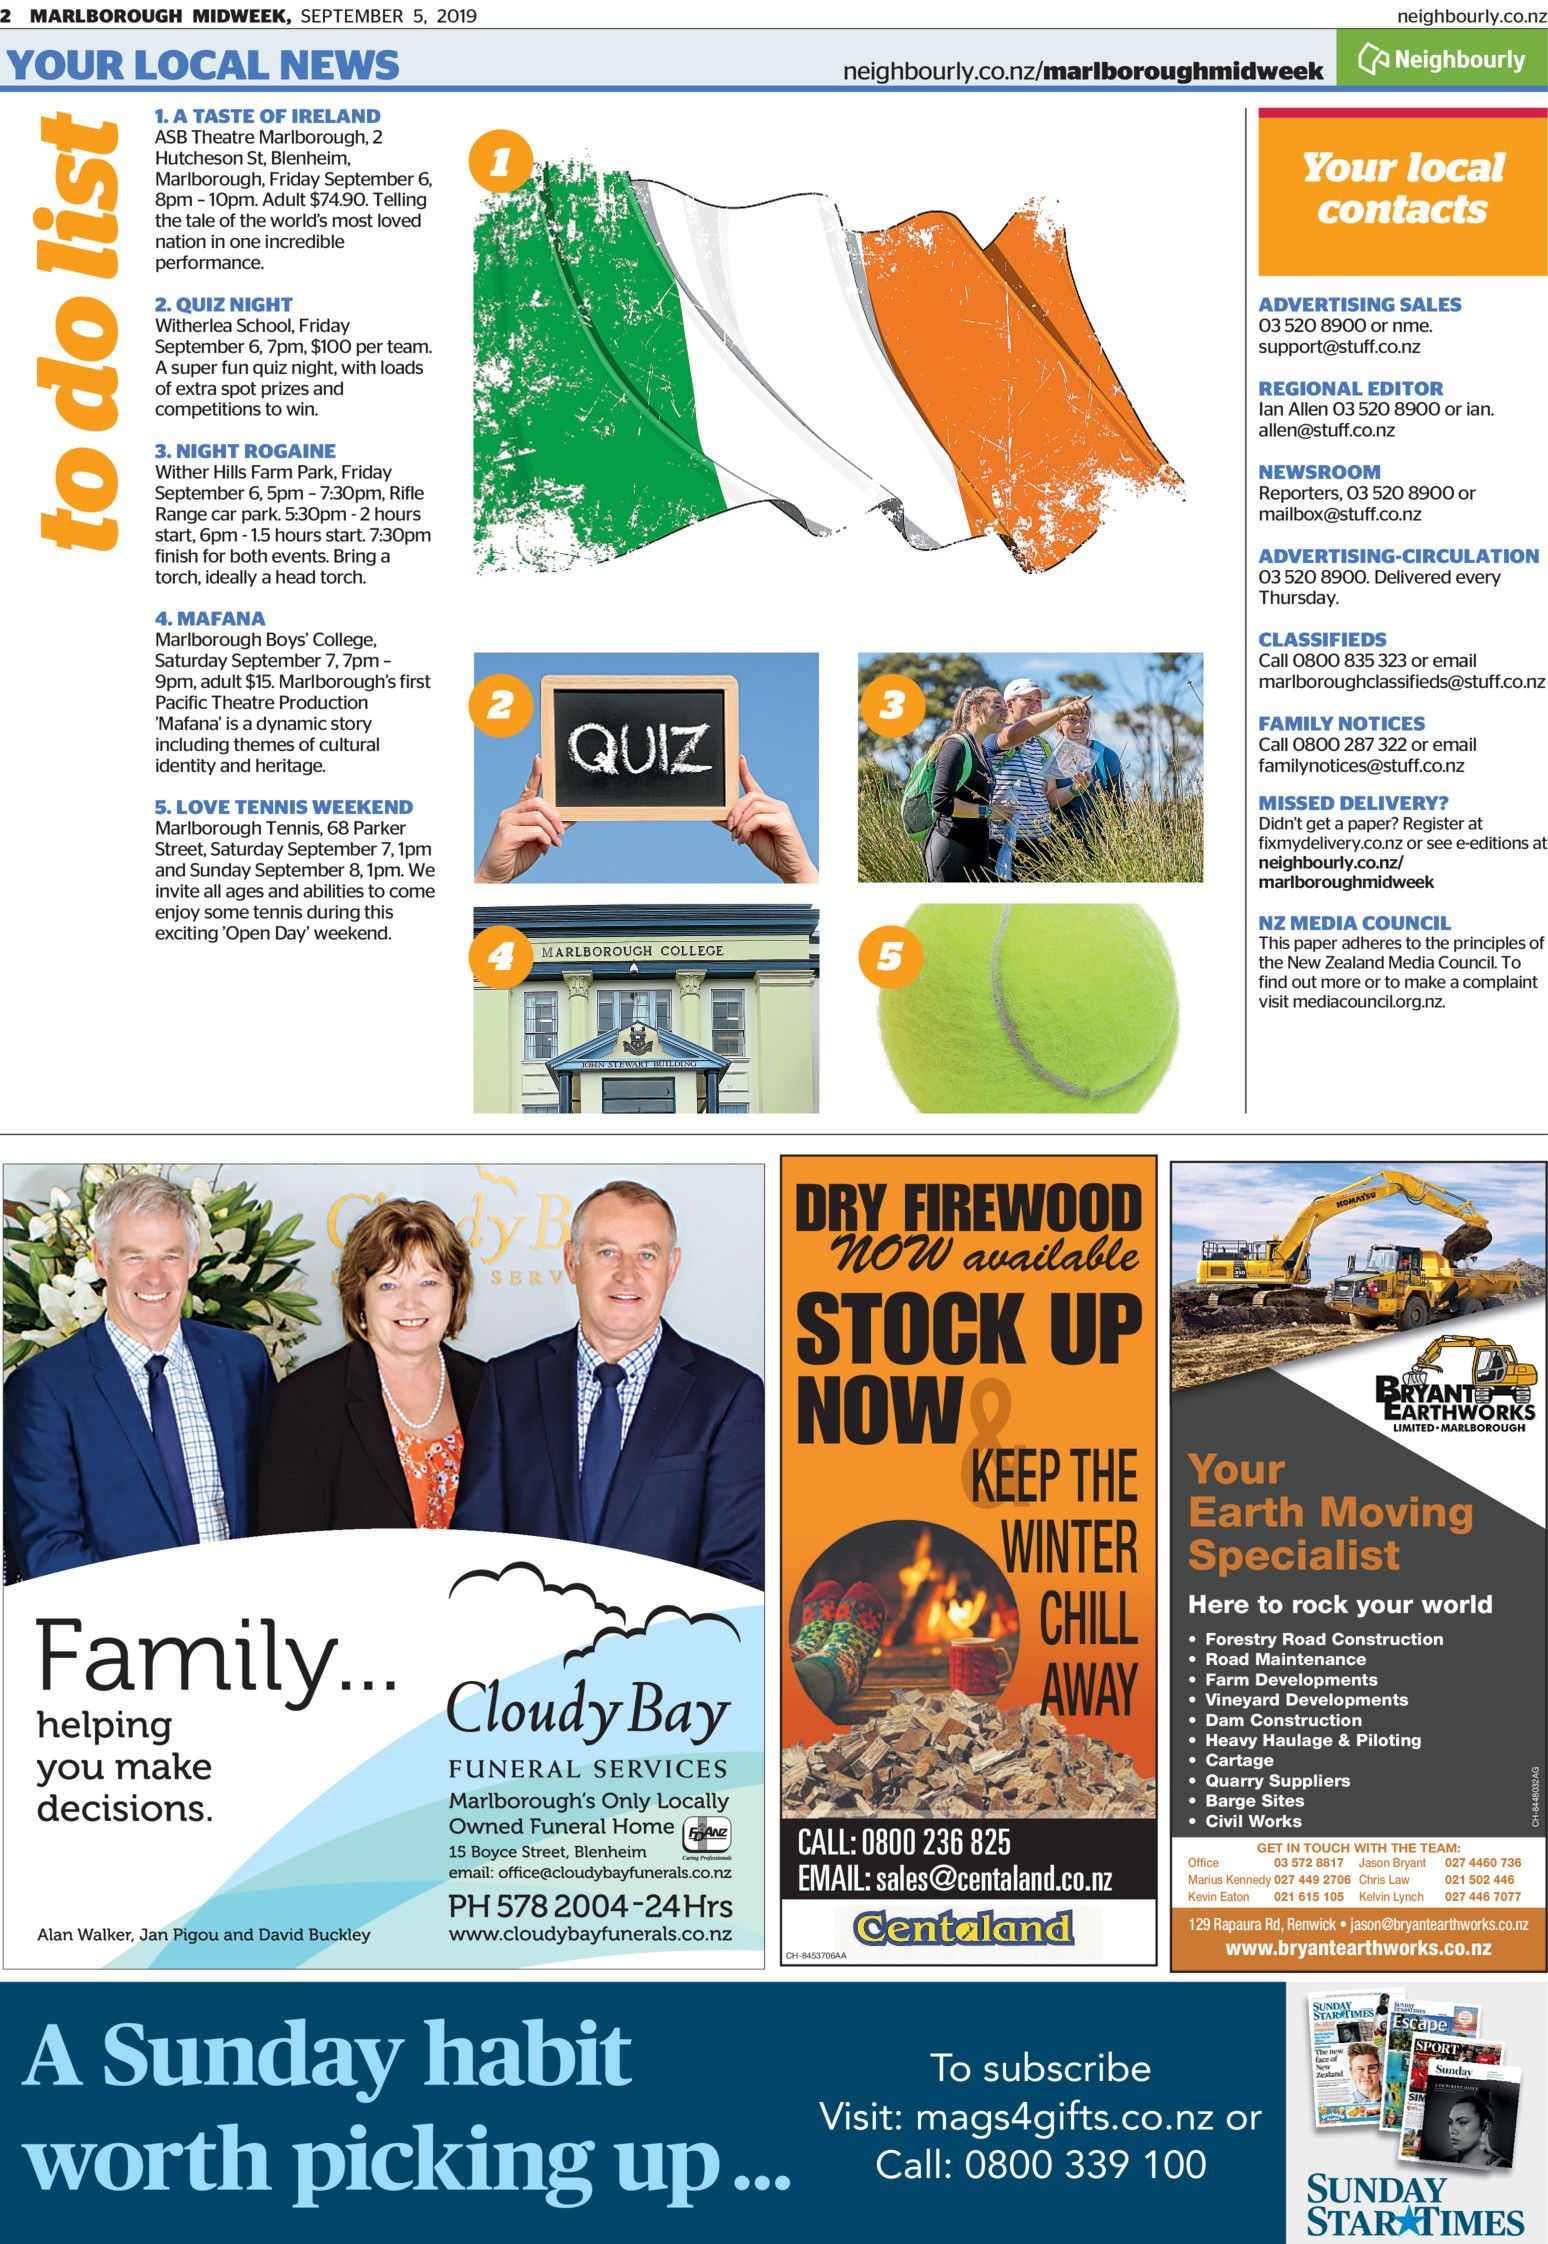 Marlborough Midweek - Read online on Neighbourly